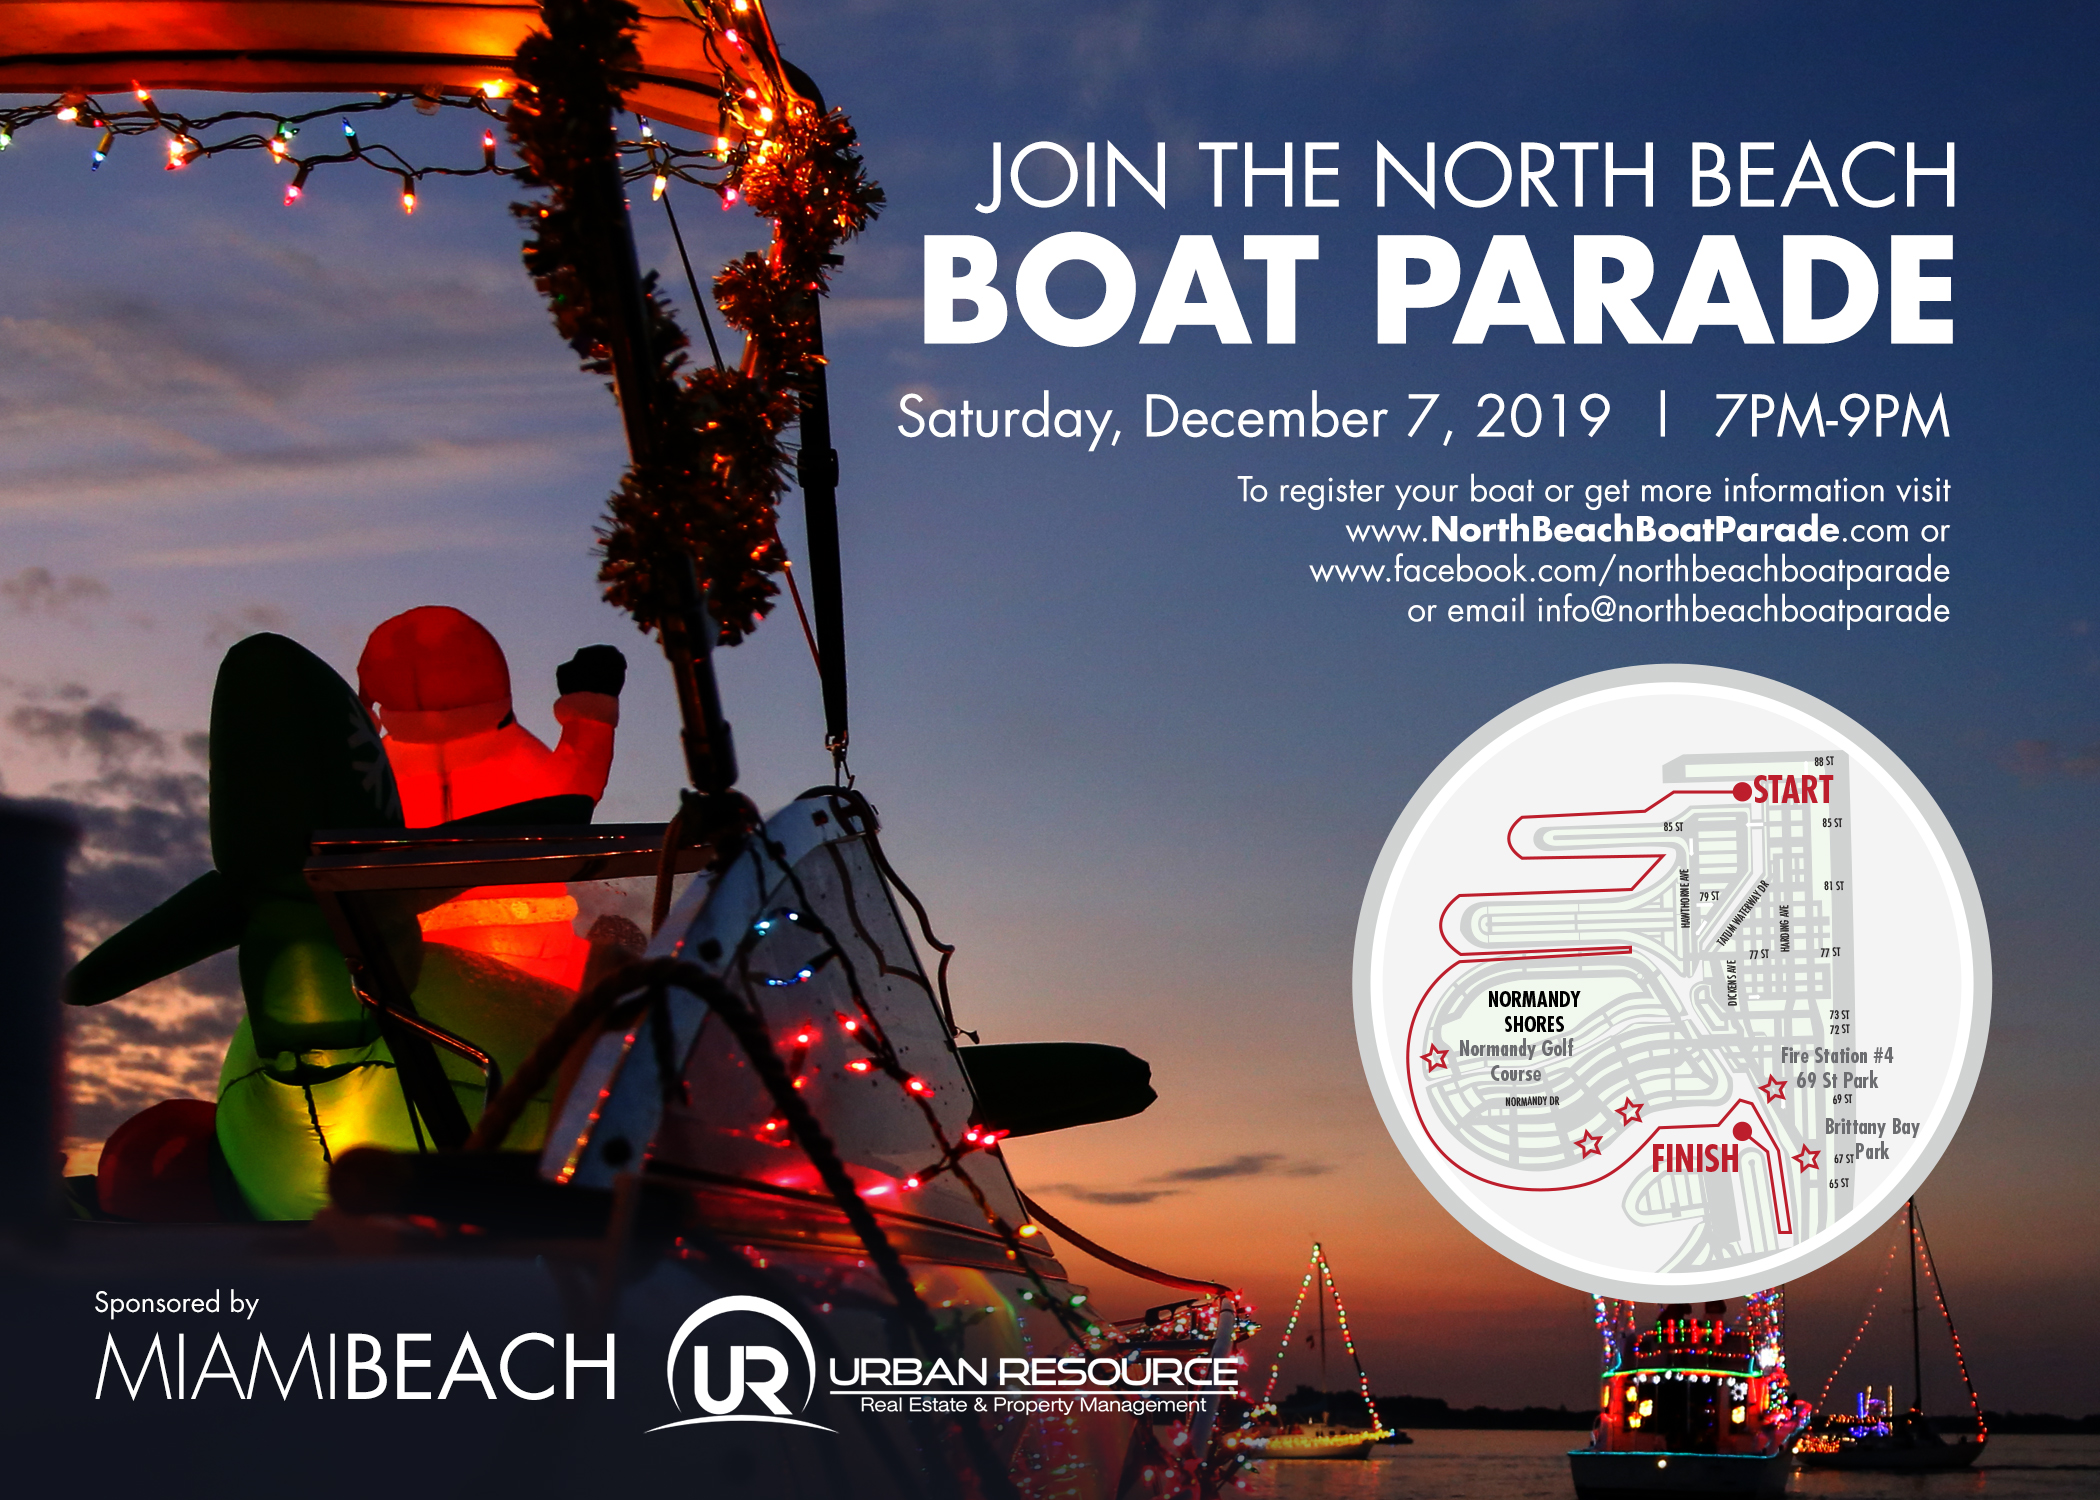 North Beach Boat Parade